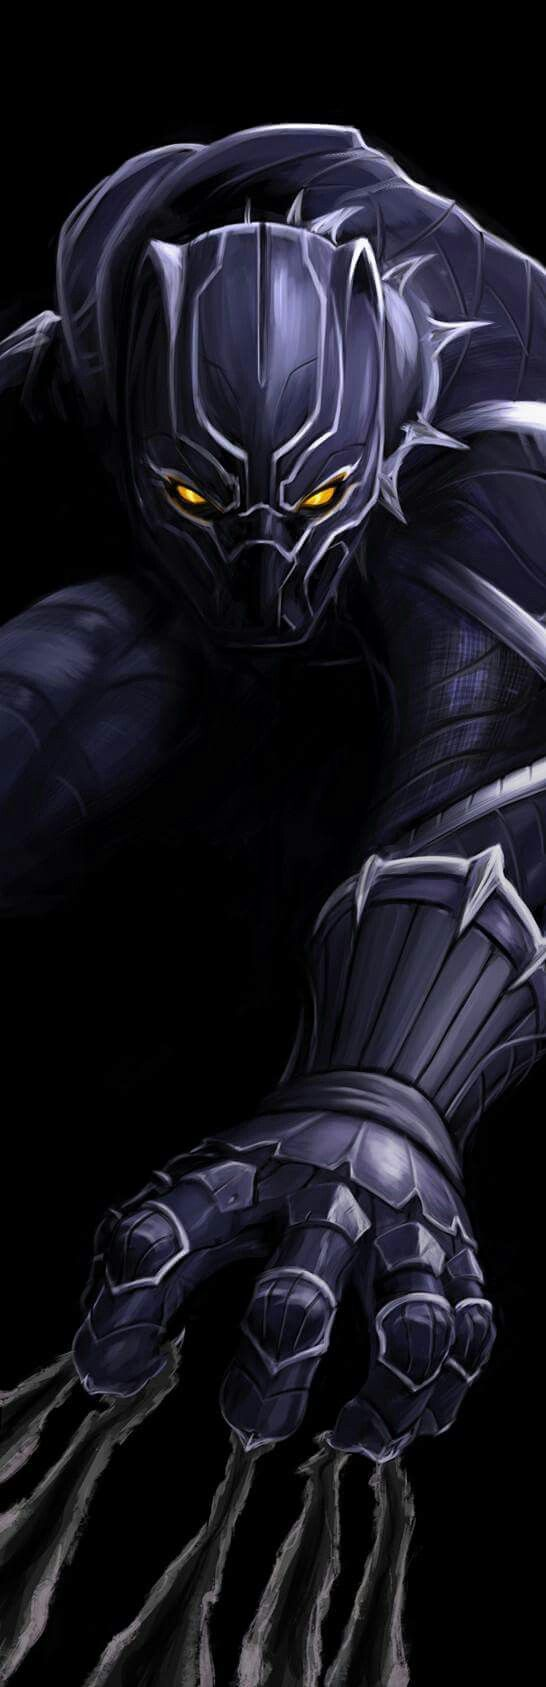 Black Panther the King